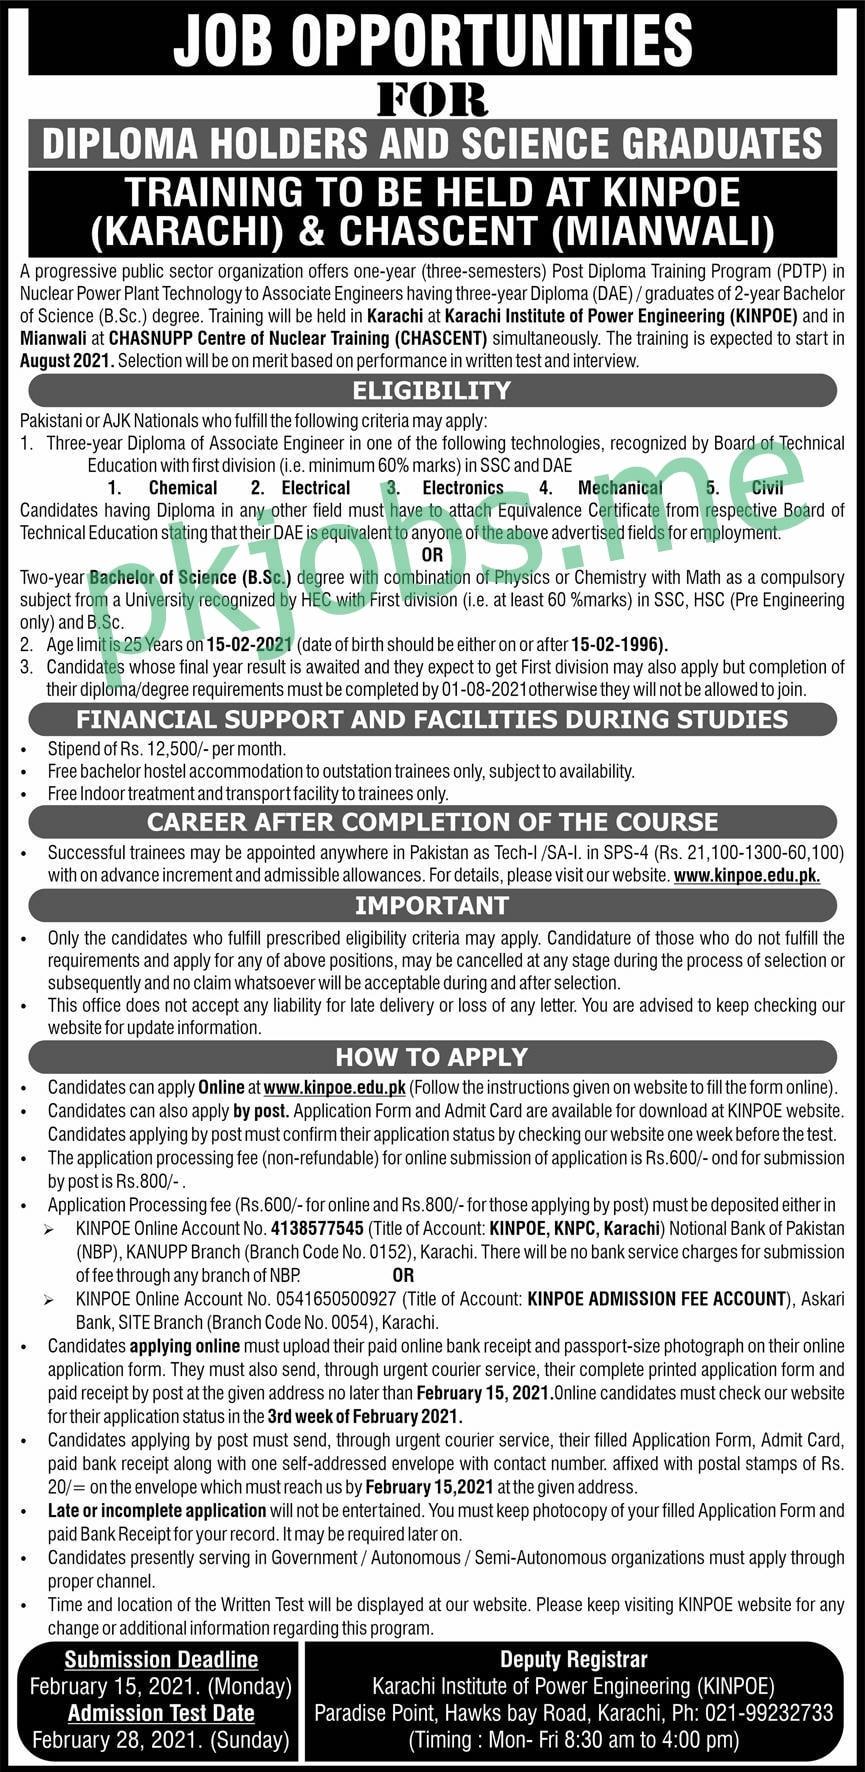 DAE Jobs in Pakistan 2021 (Civil, Electrical, Mechanical, Chemical)